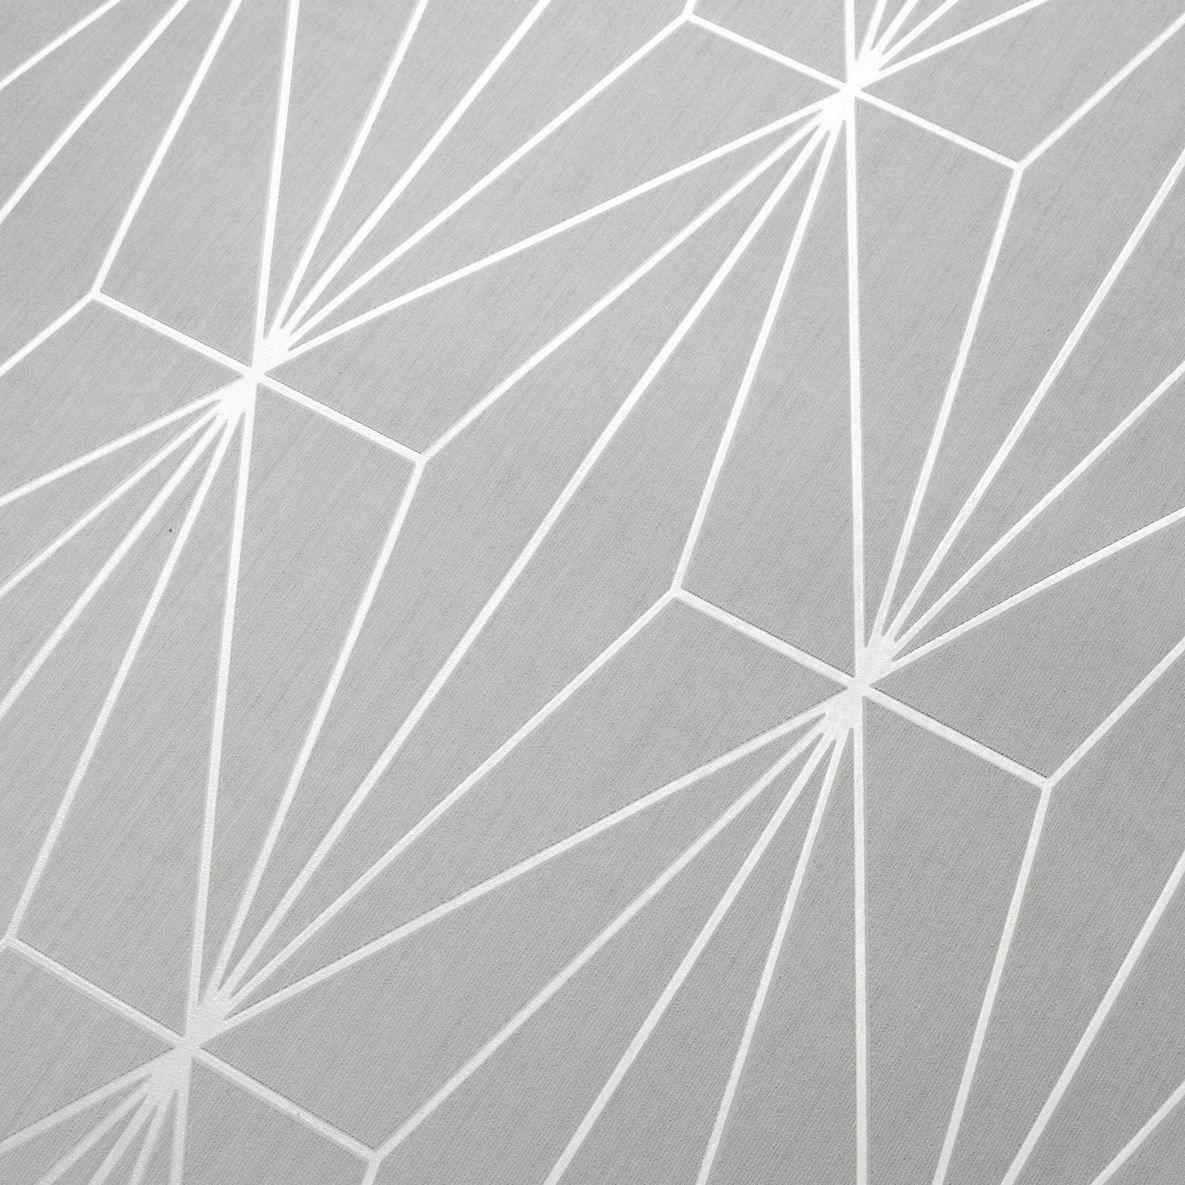 WM70301001 Geometric lines wallpaper Gray Silver Metallic